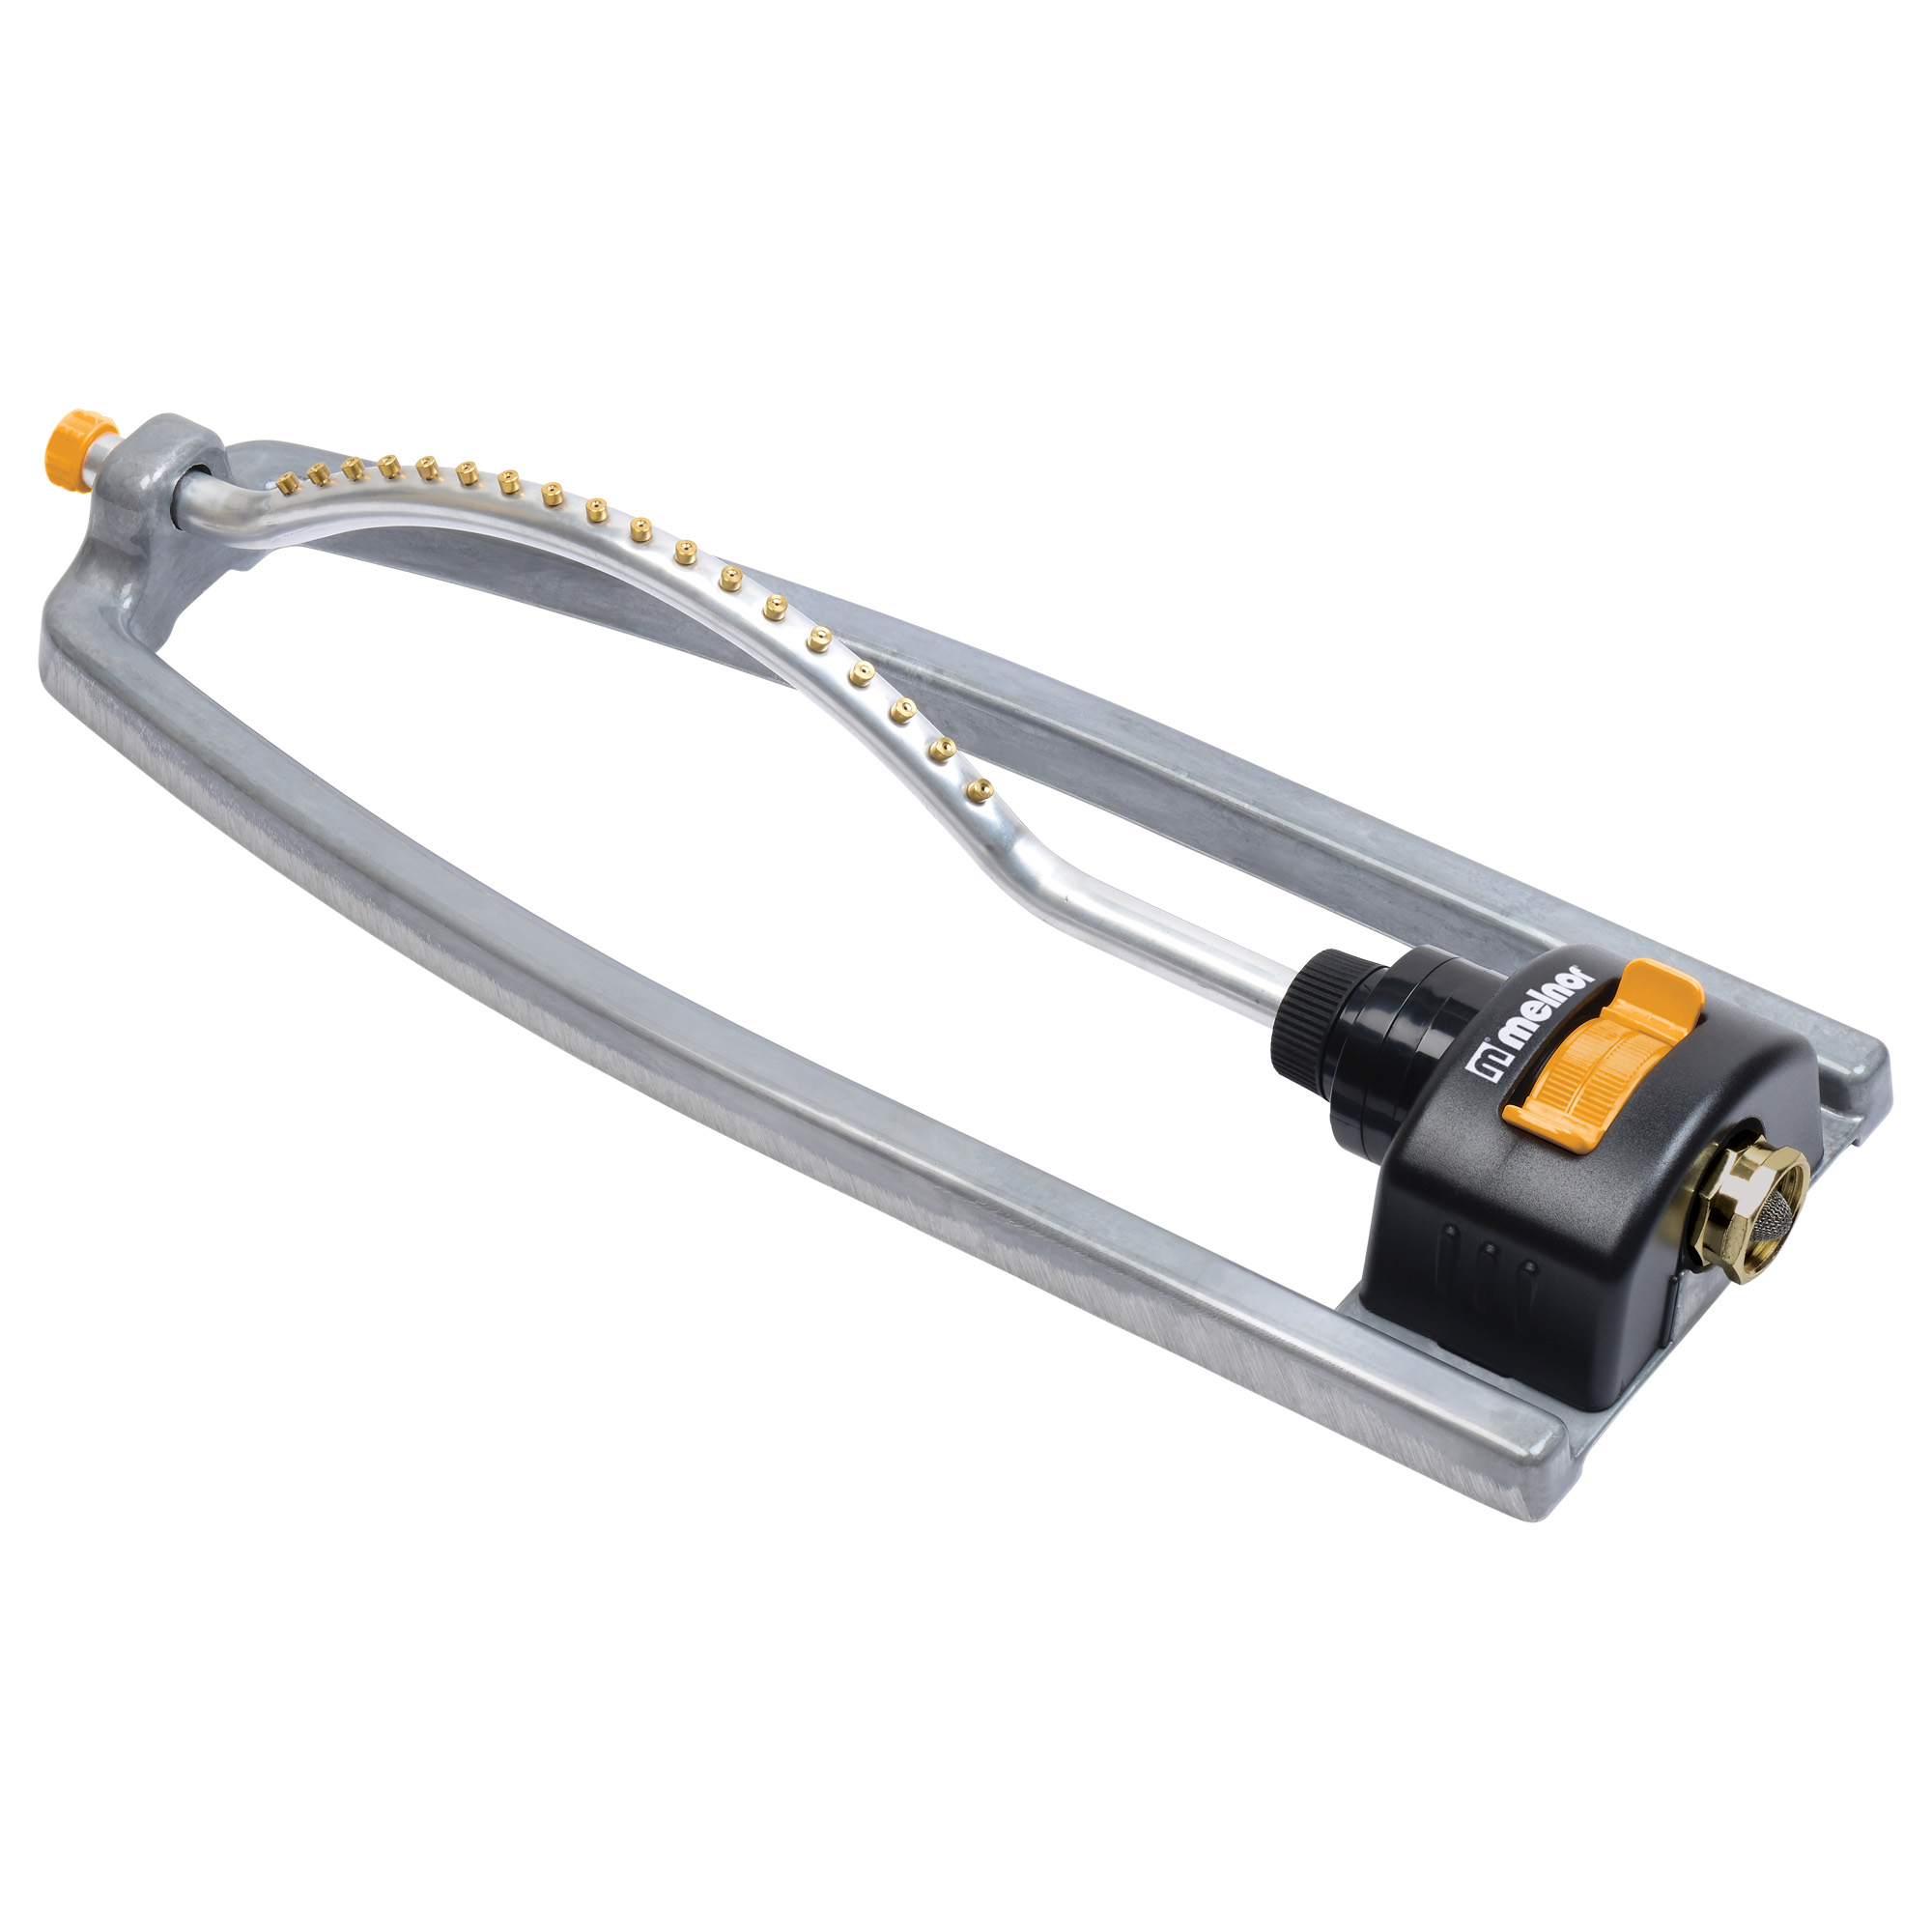 Melnor XT Metal Turbo Oscillating Sprinkler, 3600 Square Ft.